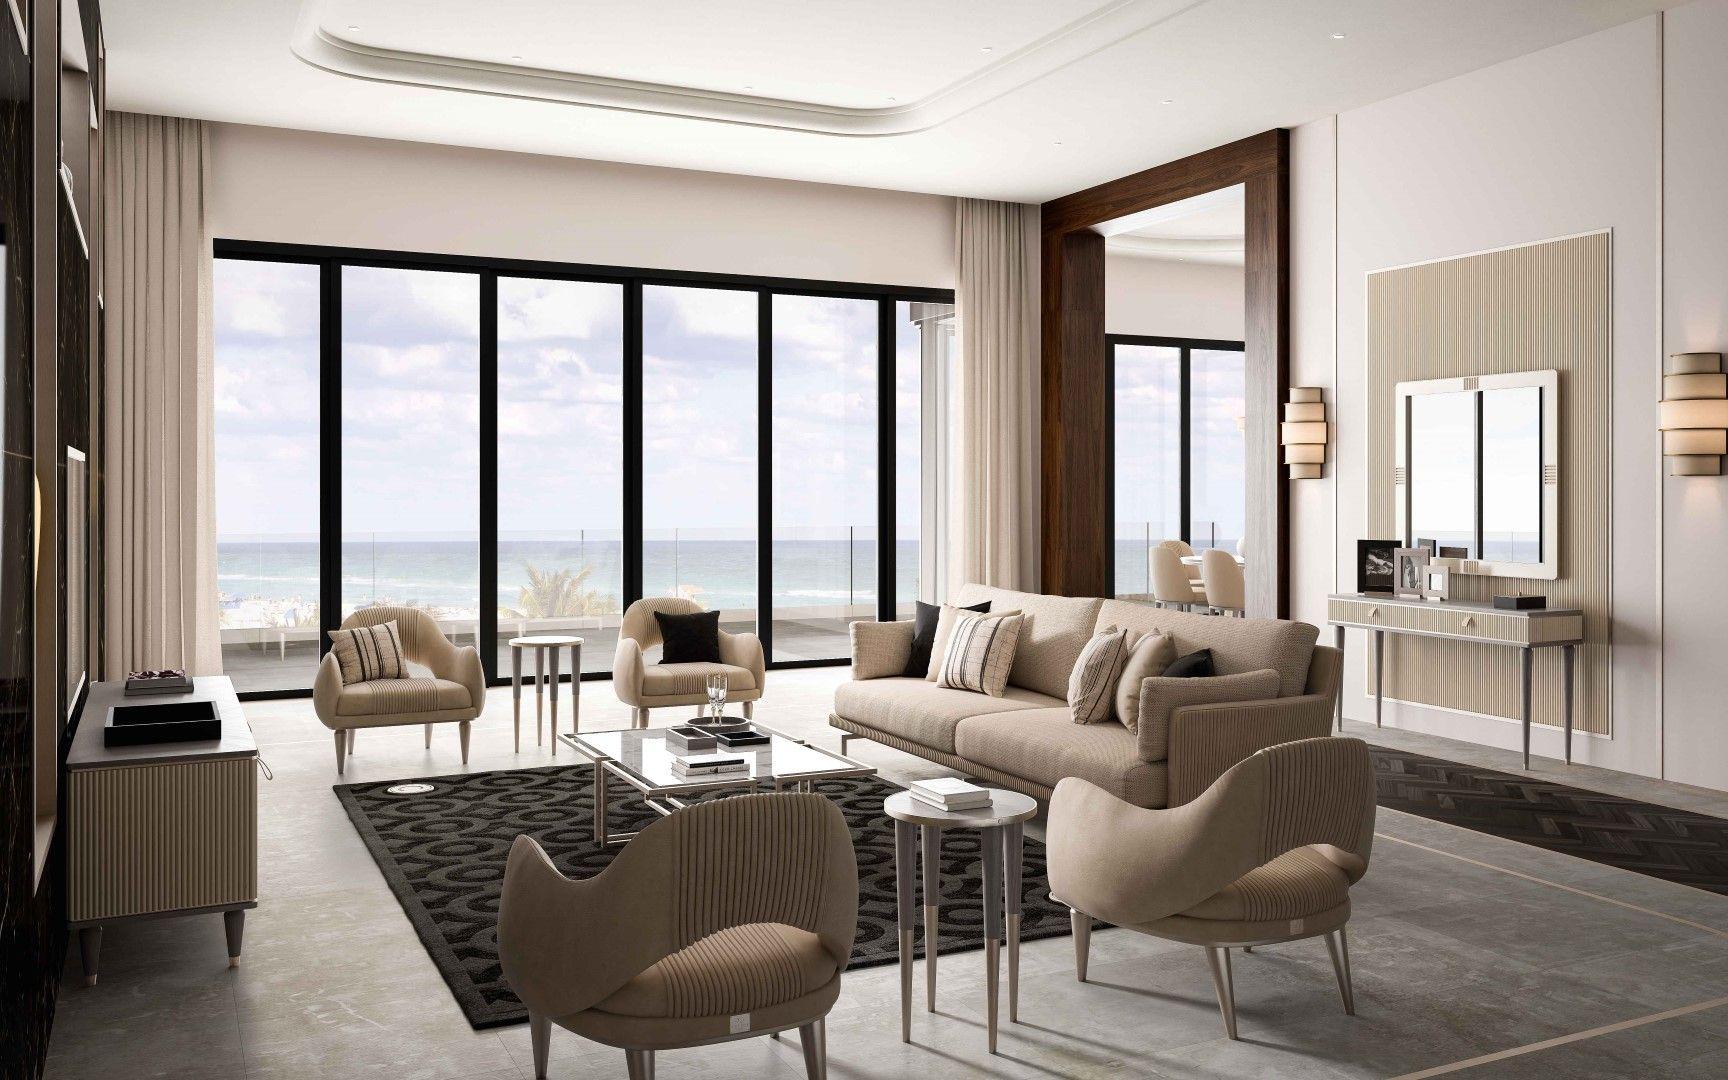 Ottimo Brings Luxury Italian Furniture Brand Cipriani Homood To India The Architects Diary Luxury Italian Furniture Italian Furniture Brands Luxury Furniture